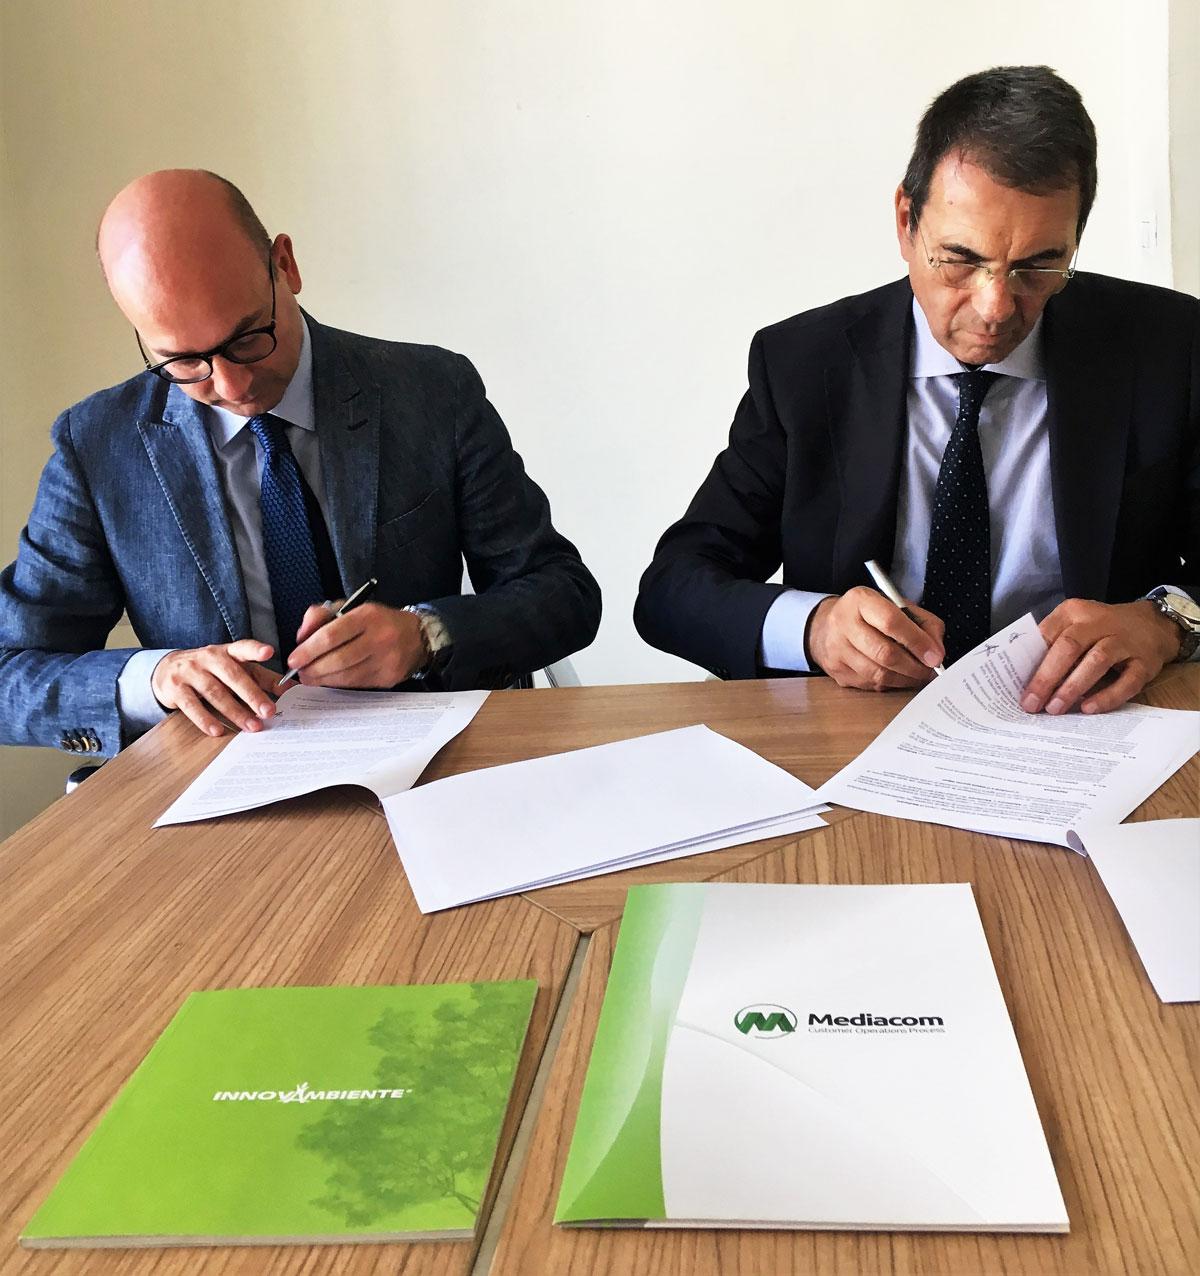 Mediacom Partnership Innovambiente